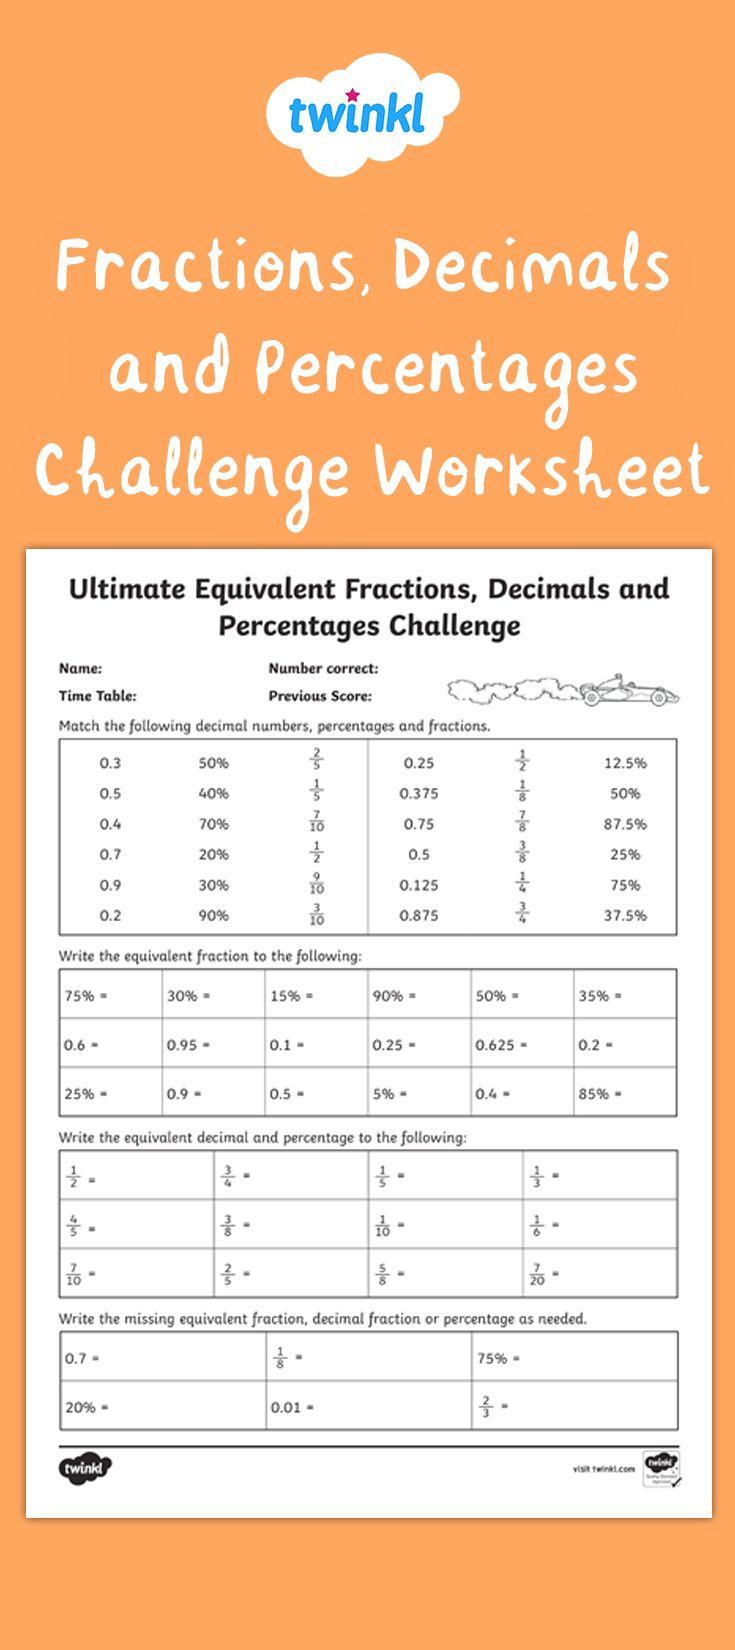 Equivalent Fractions Decimals And Percentages Challenge Worksheet In 2020 Fractions Decimals Percents Equivalent Fractions Decimals